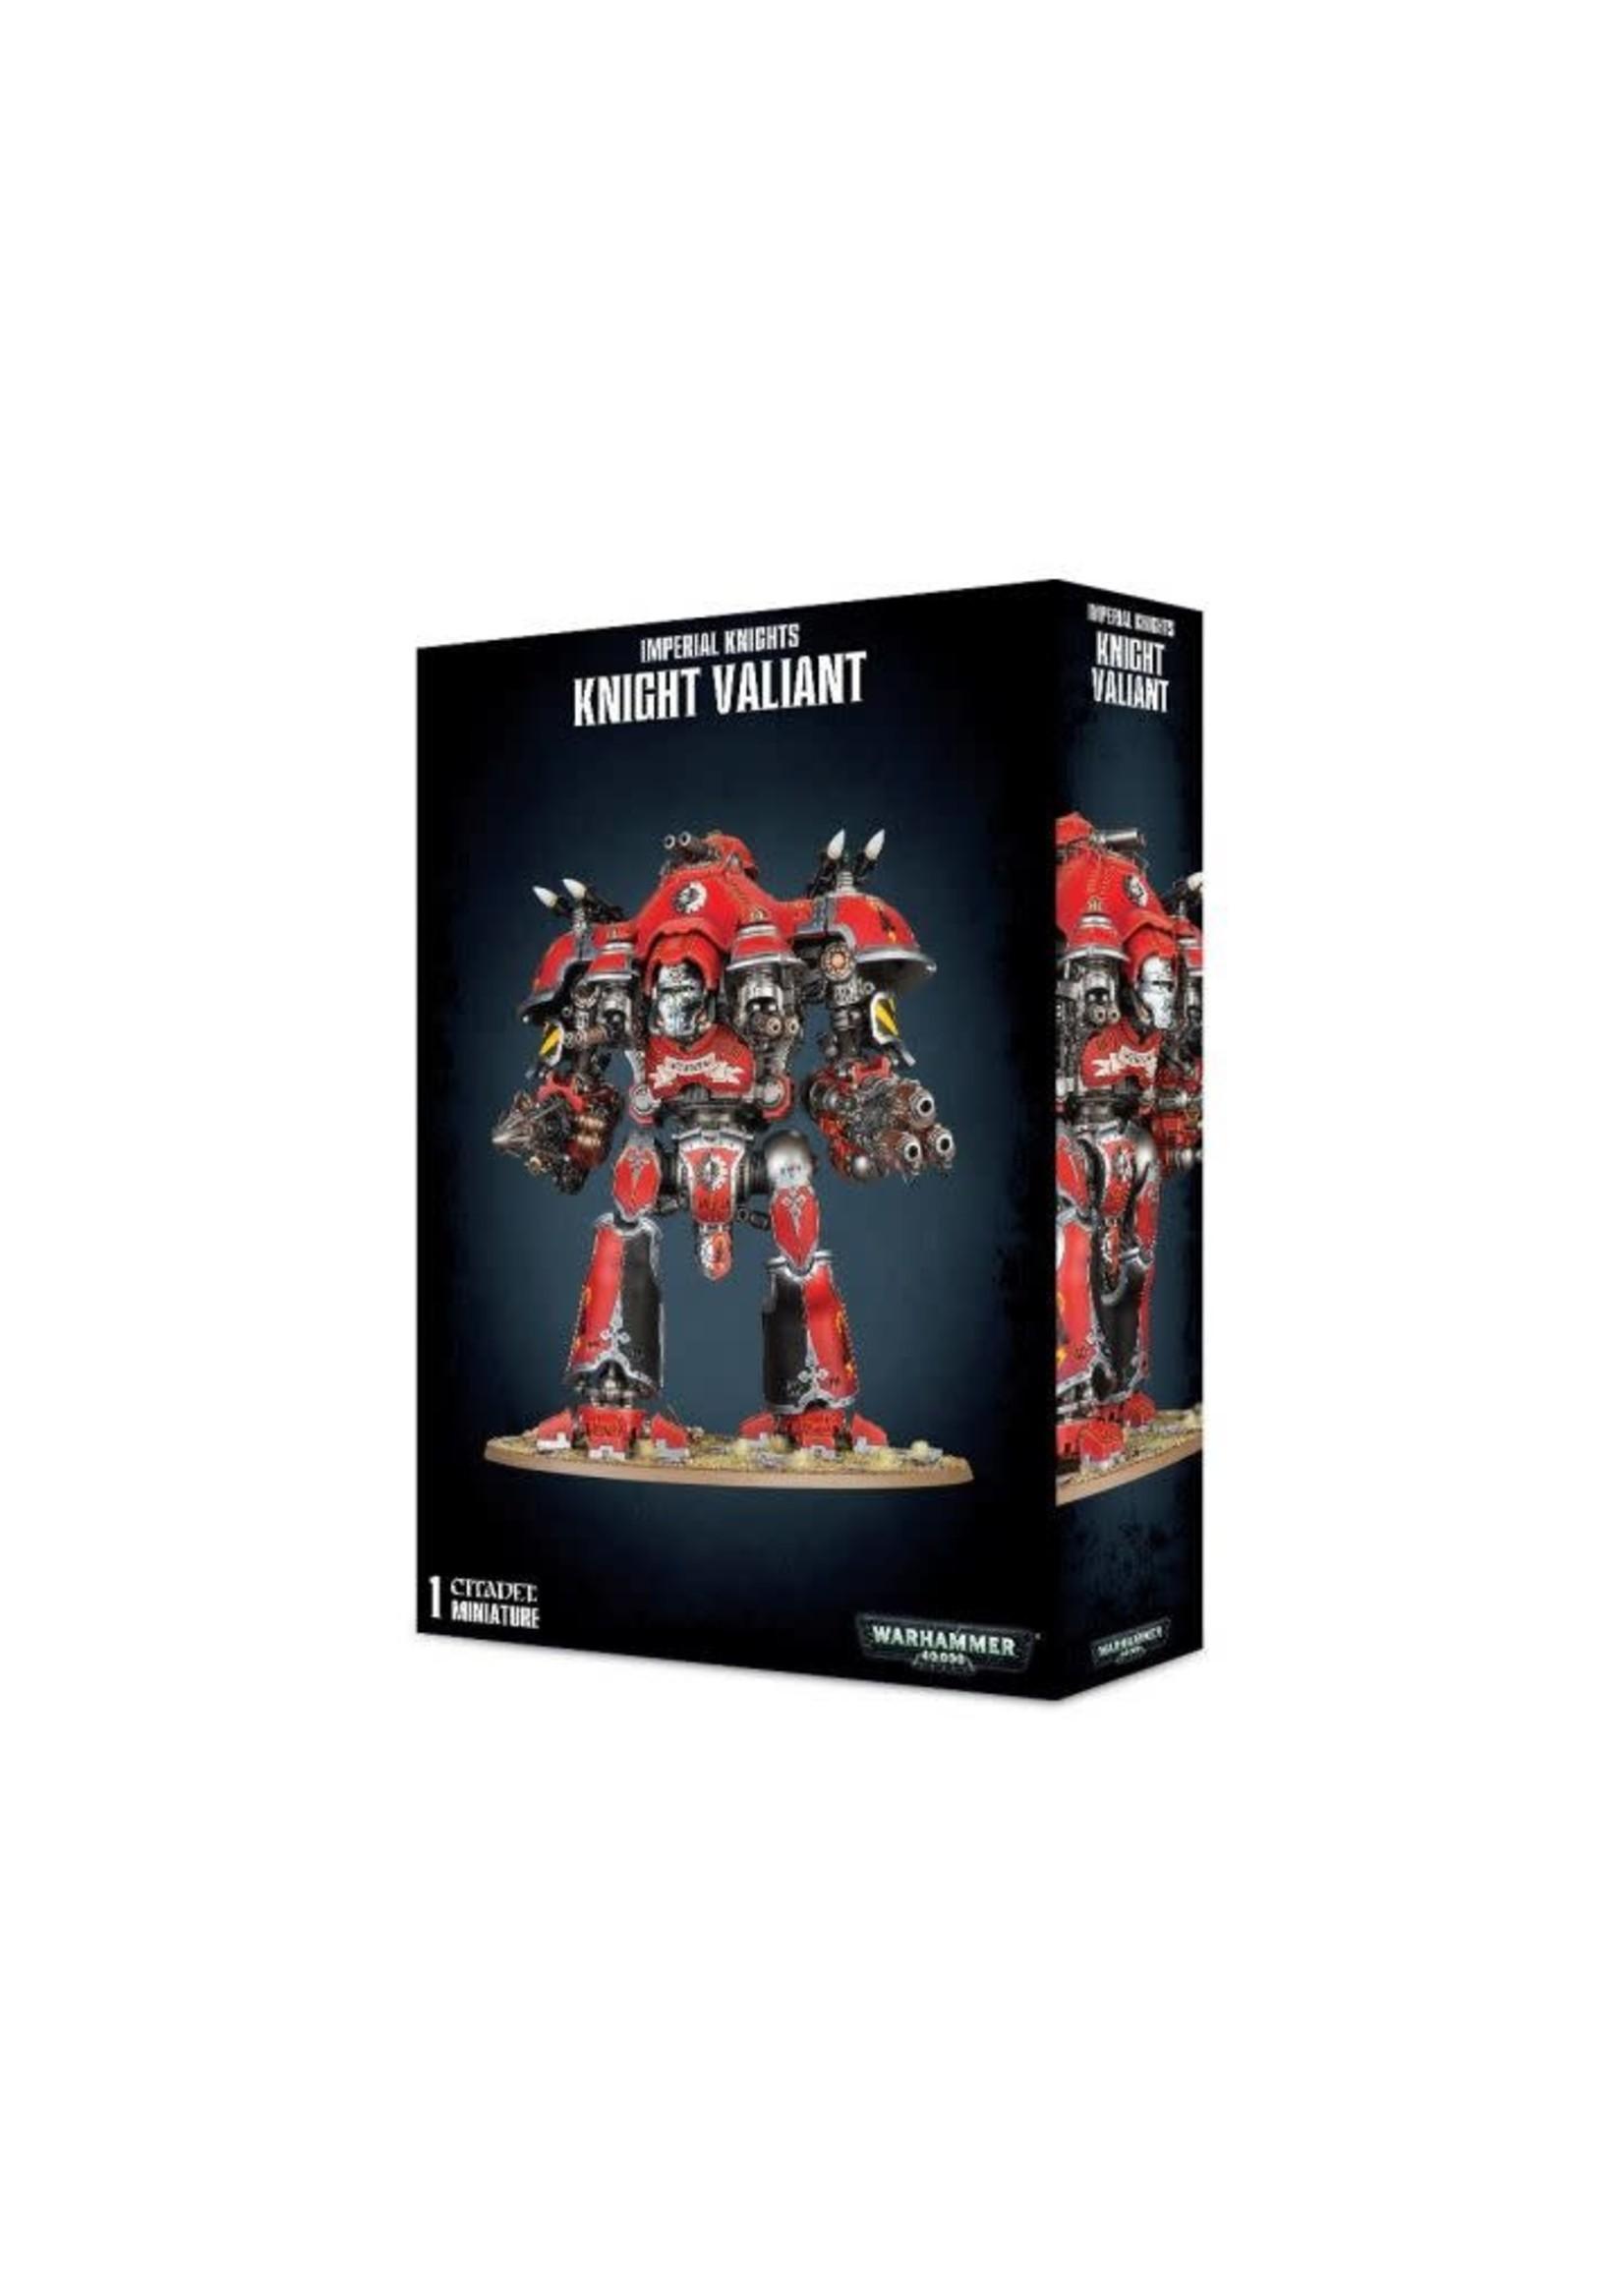 Imperial Knights: Knight Valiant